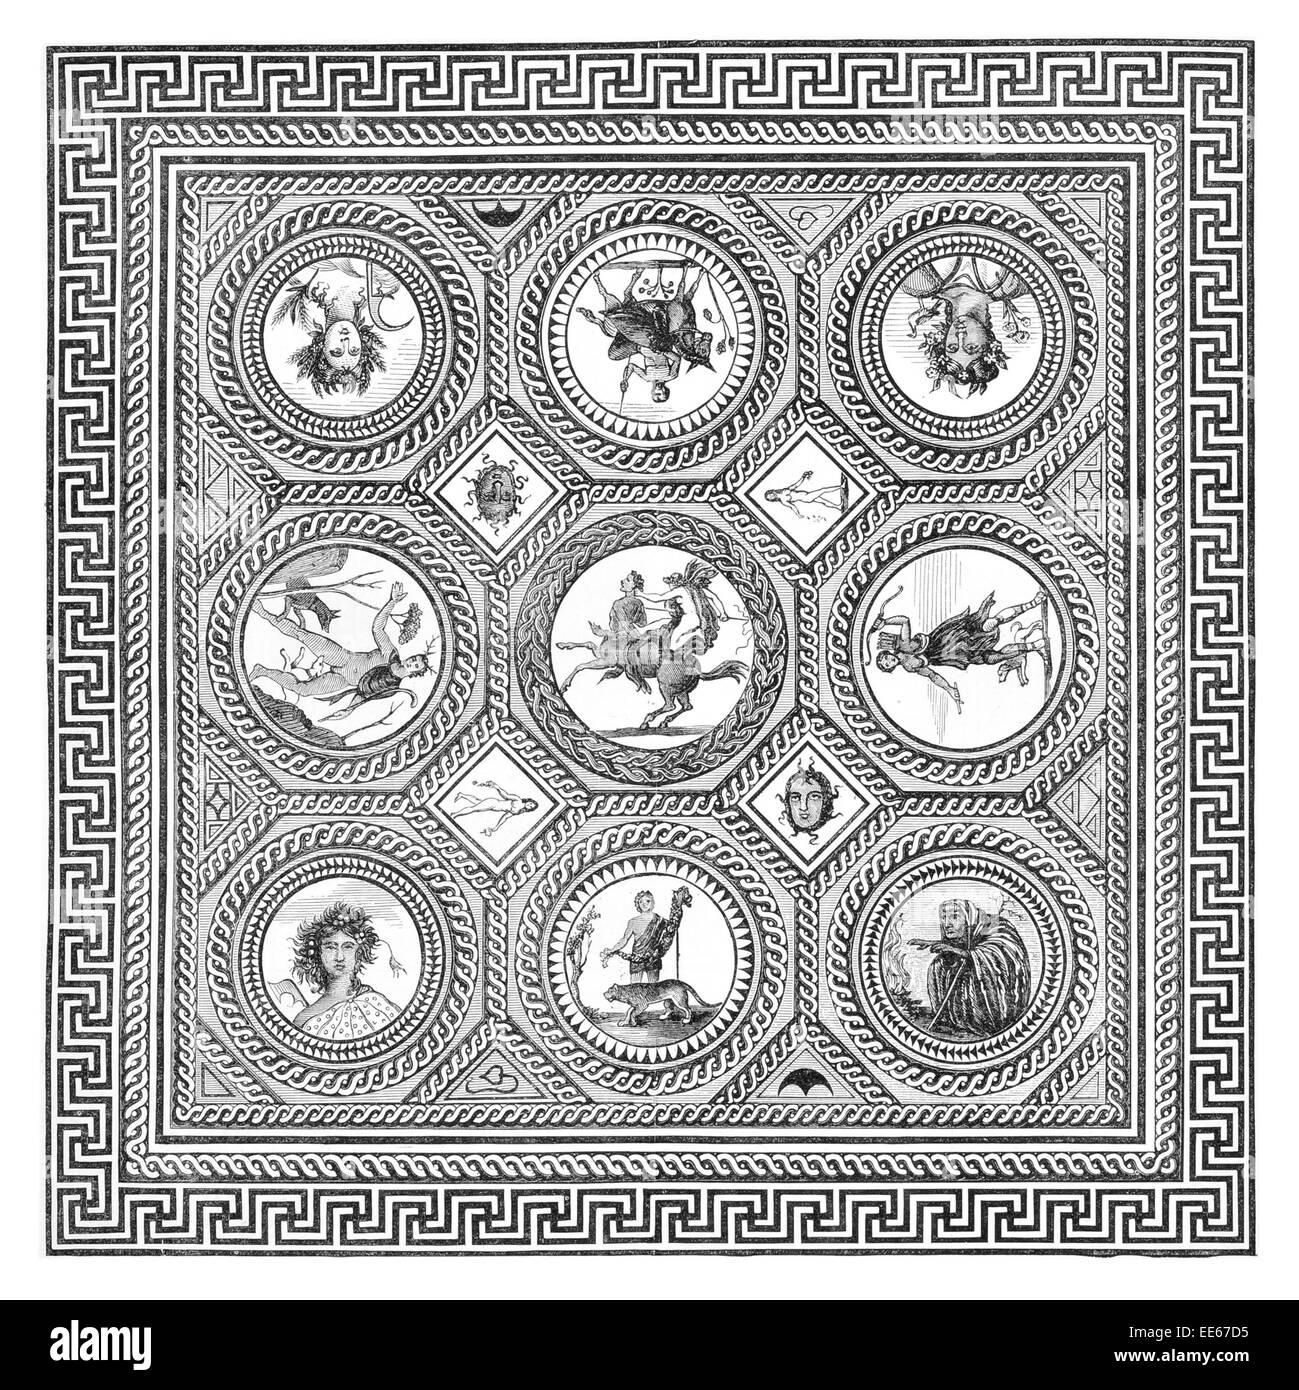 Mosaic pavement messrs hare bristol tessera roman design ceramic mosaic pavement messrs hare bristol tessera roman design ceramic tile tiles floor flooring ancient corinium mosaics doublecrazyfo Image collections